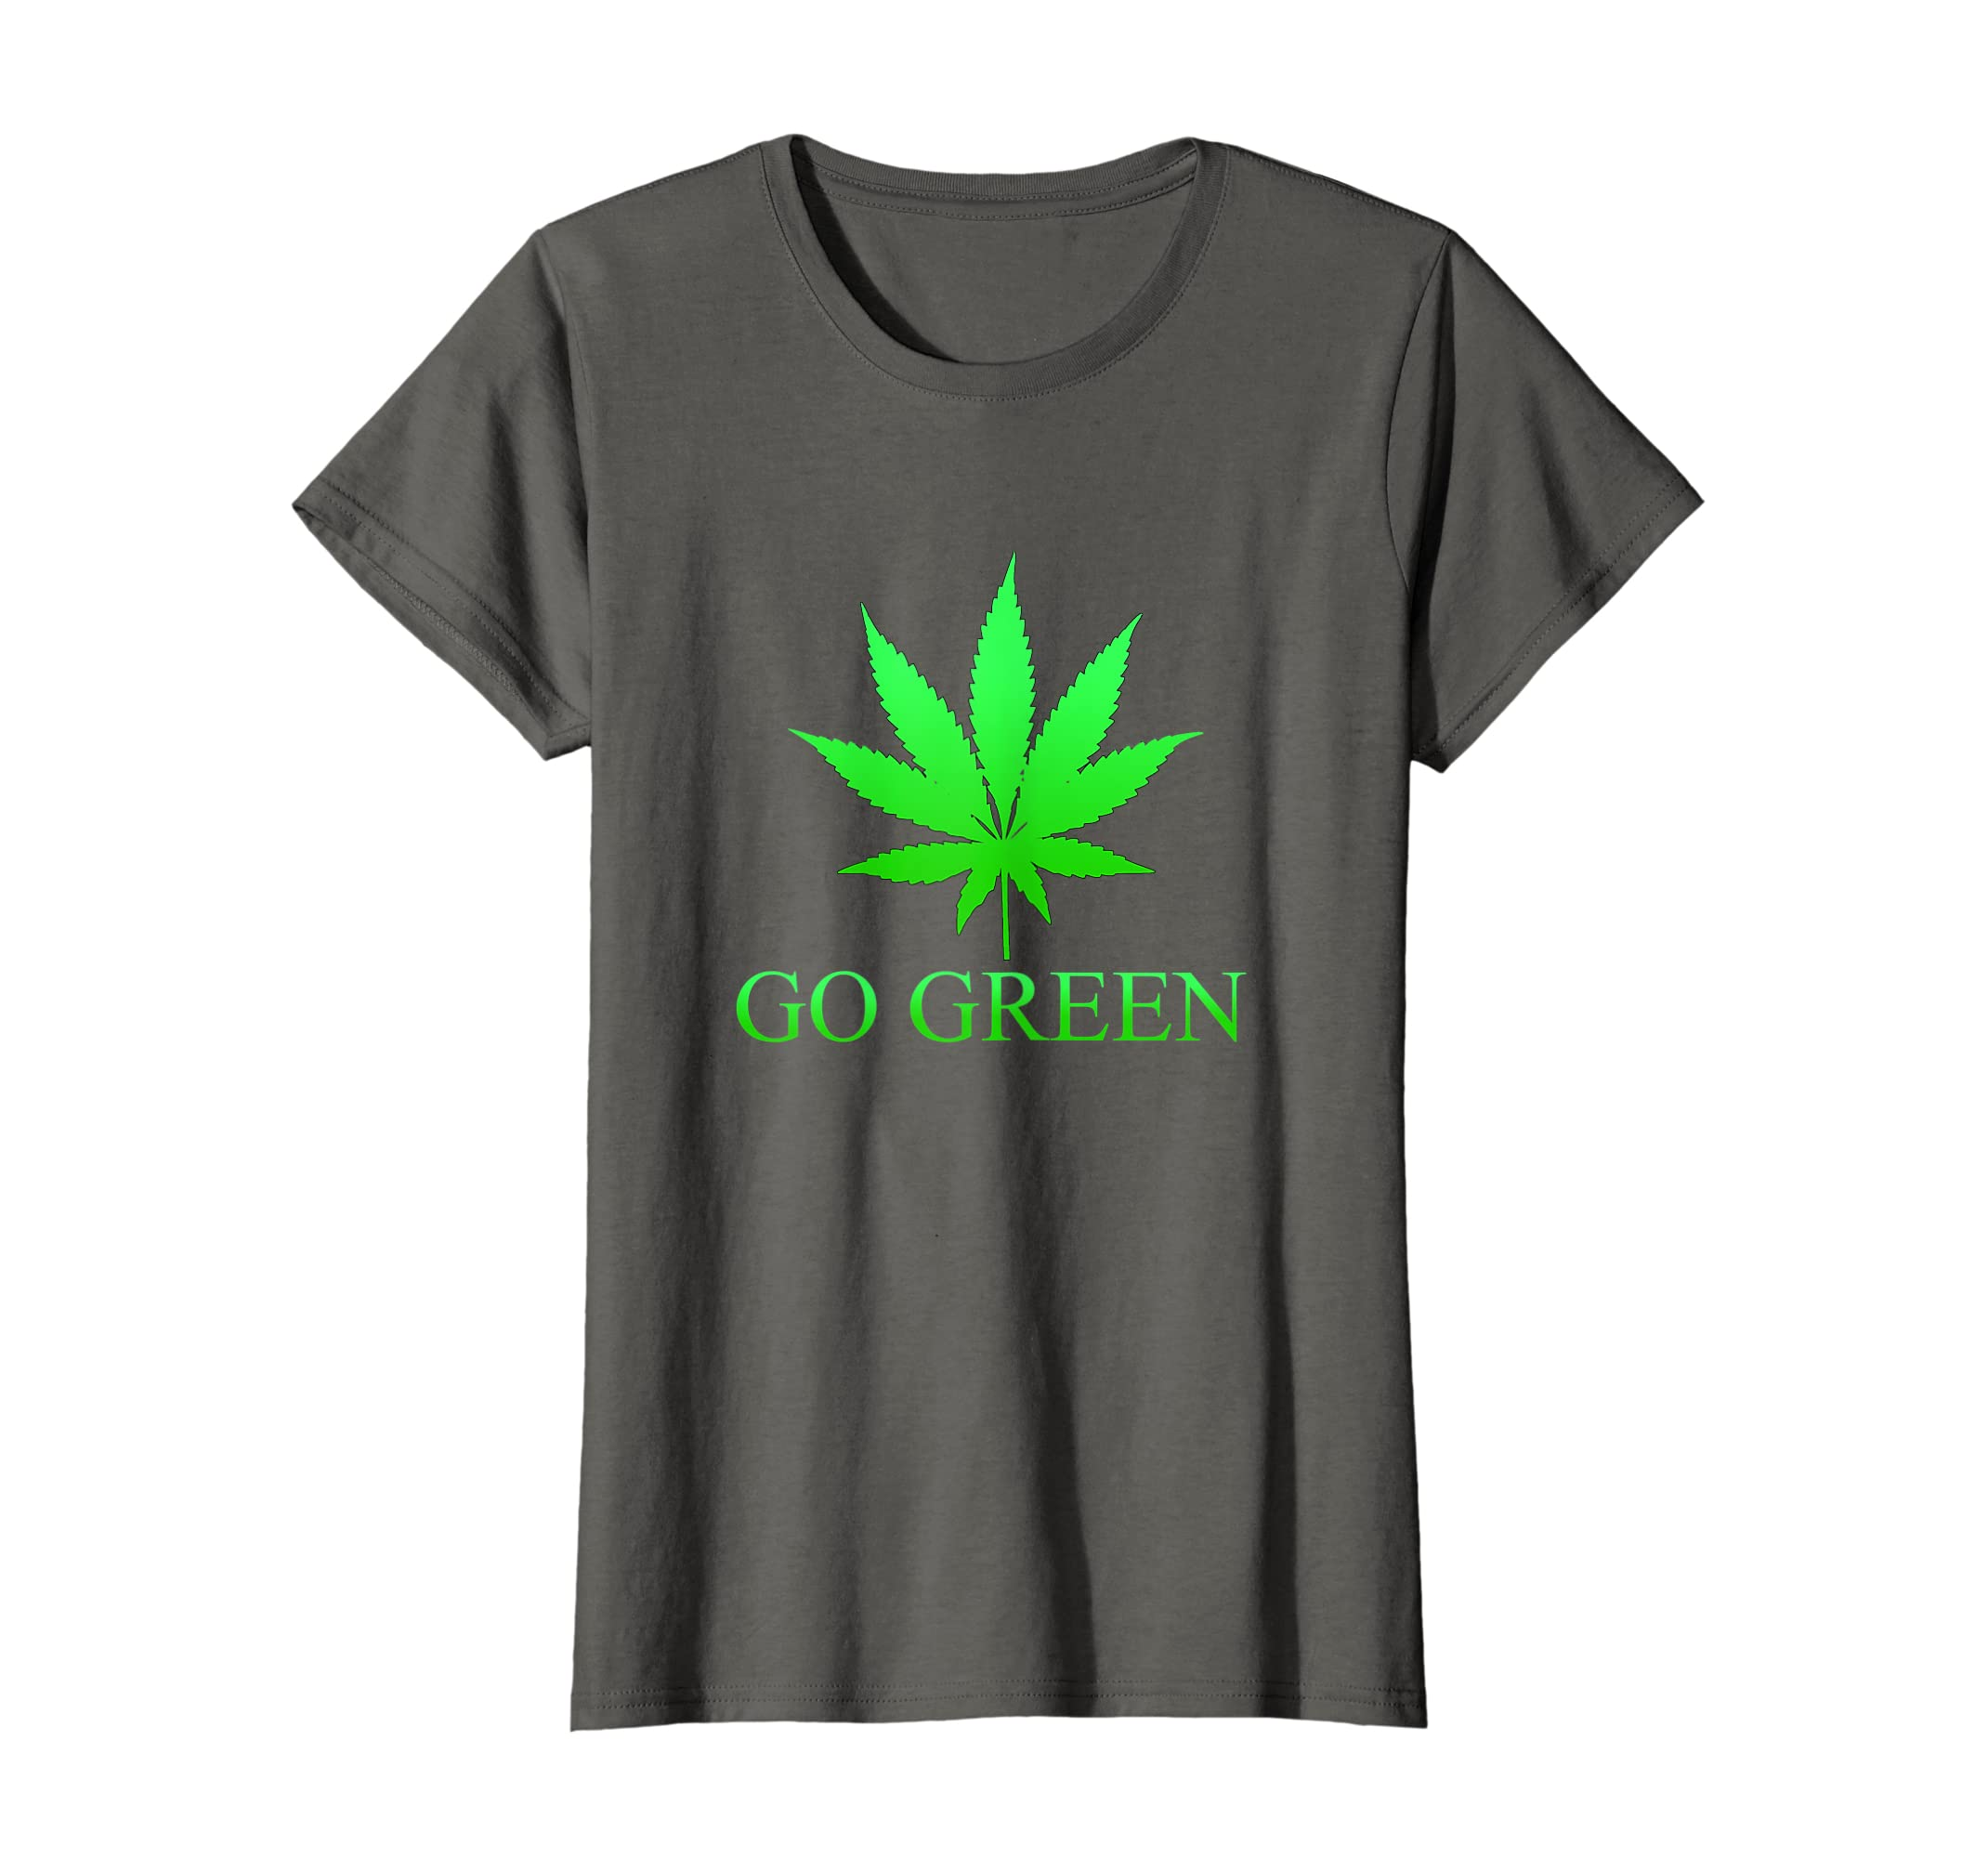 9991d3e93 Amazon.com: Go Green Weed T Shirt - Vape Nation - Marijuana Leaf 420:  Clothing